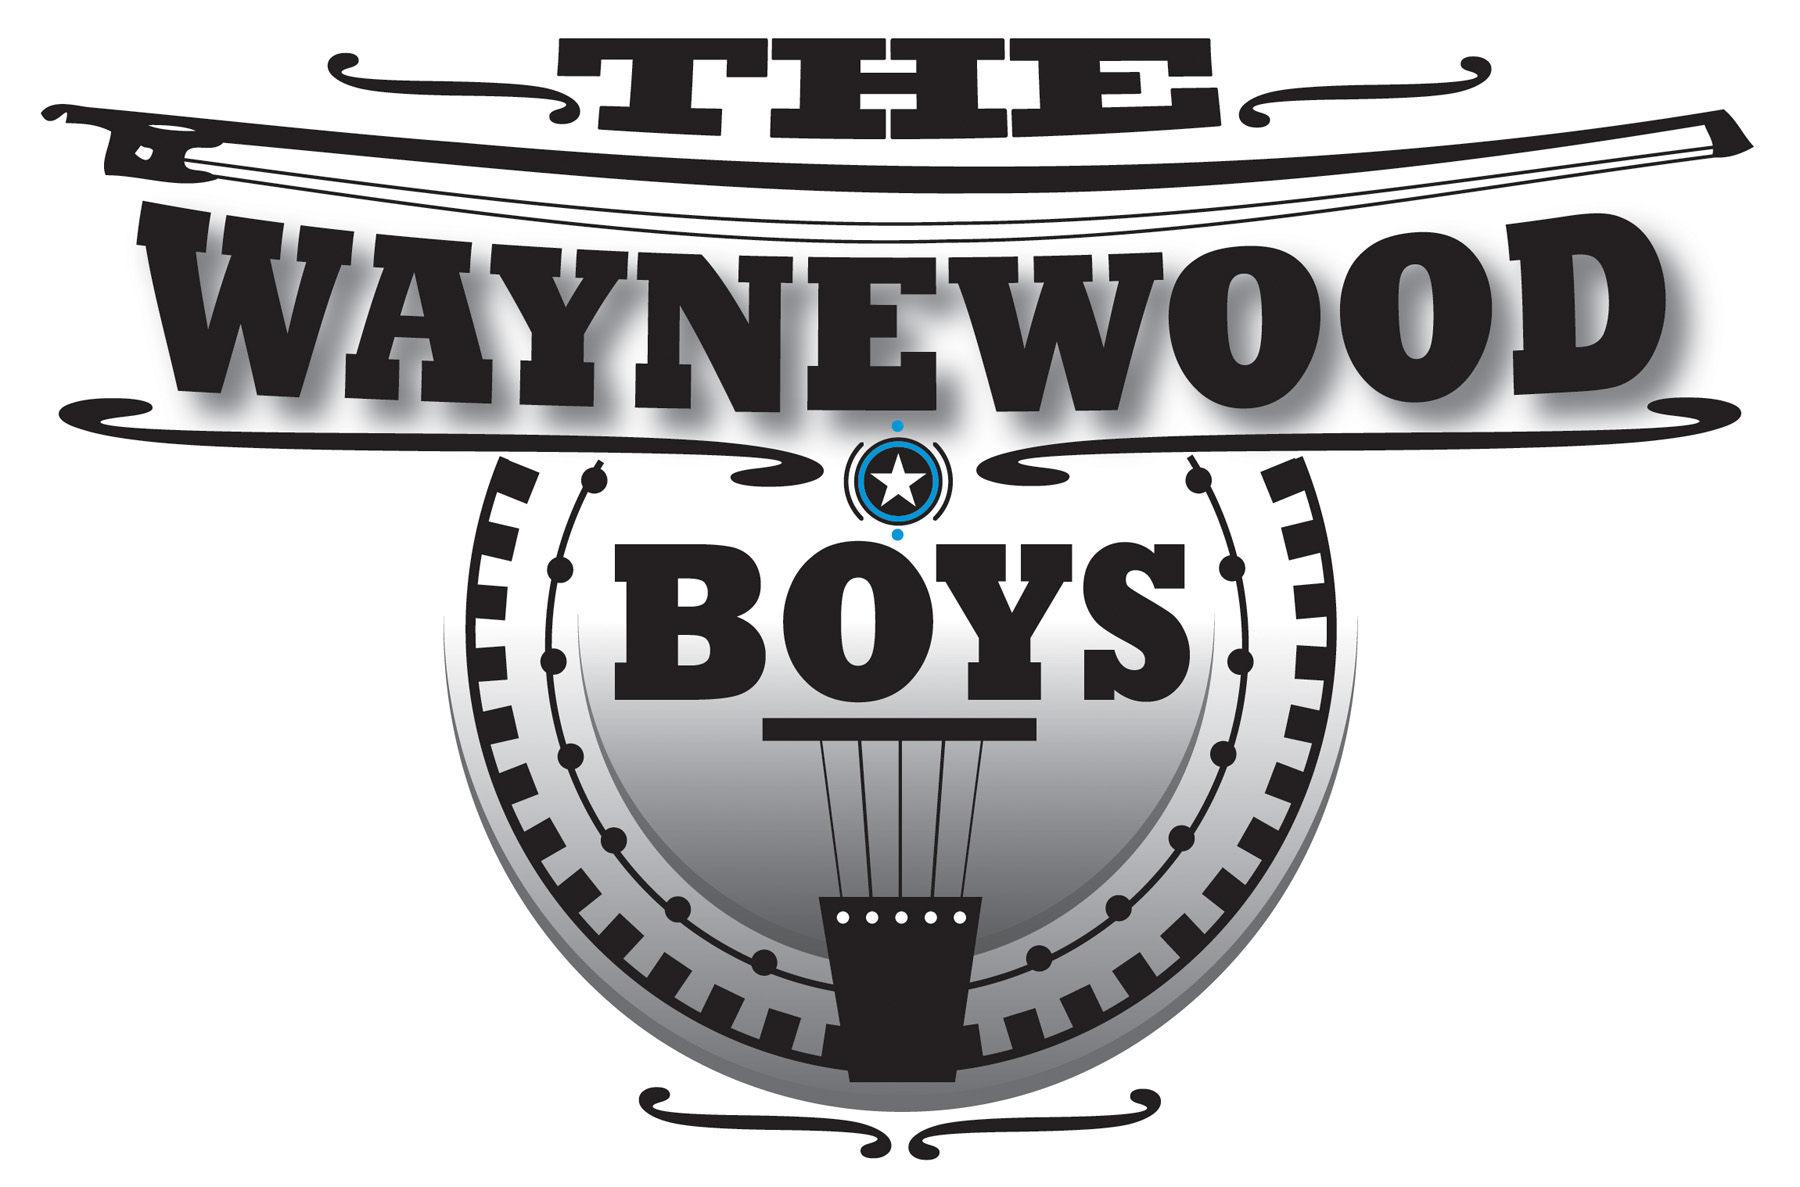 The Waynewood Boys